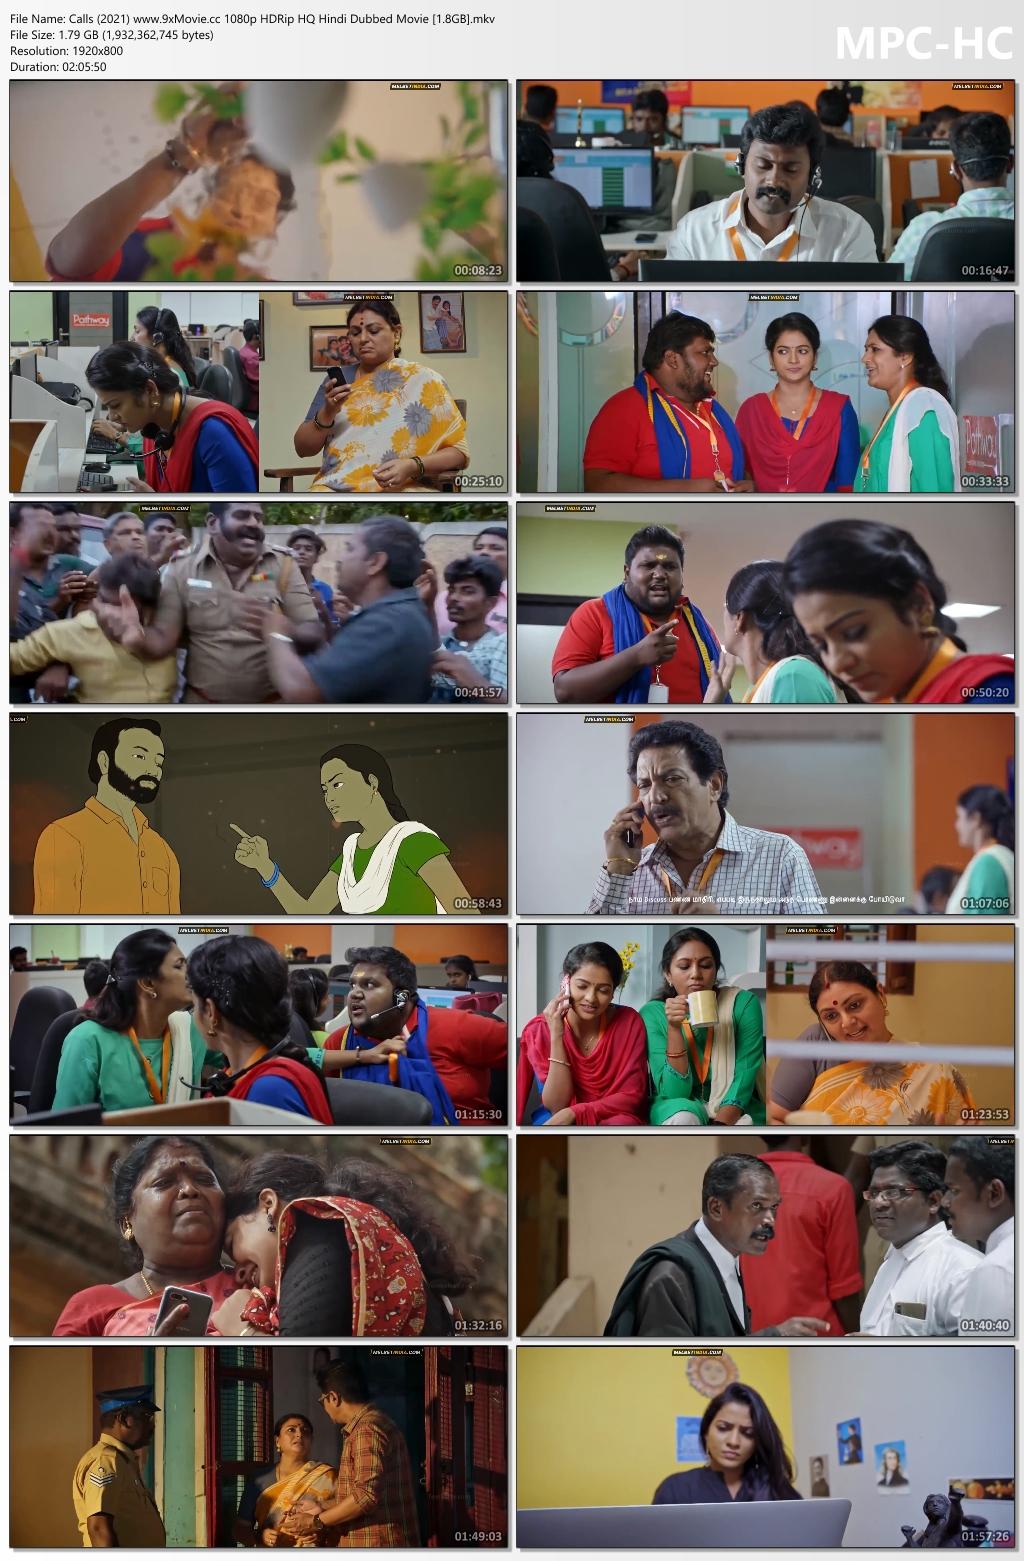 Calls-2021-www-9x-Movie-cc-1080p-HDRip-HQ-Hindi-Dubbed-Movie-1-8-GB-mkv